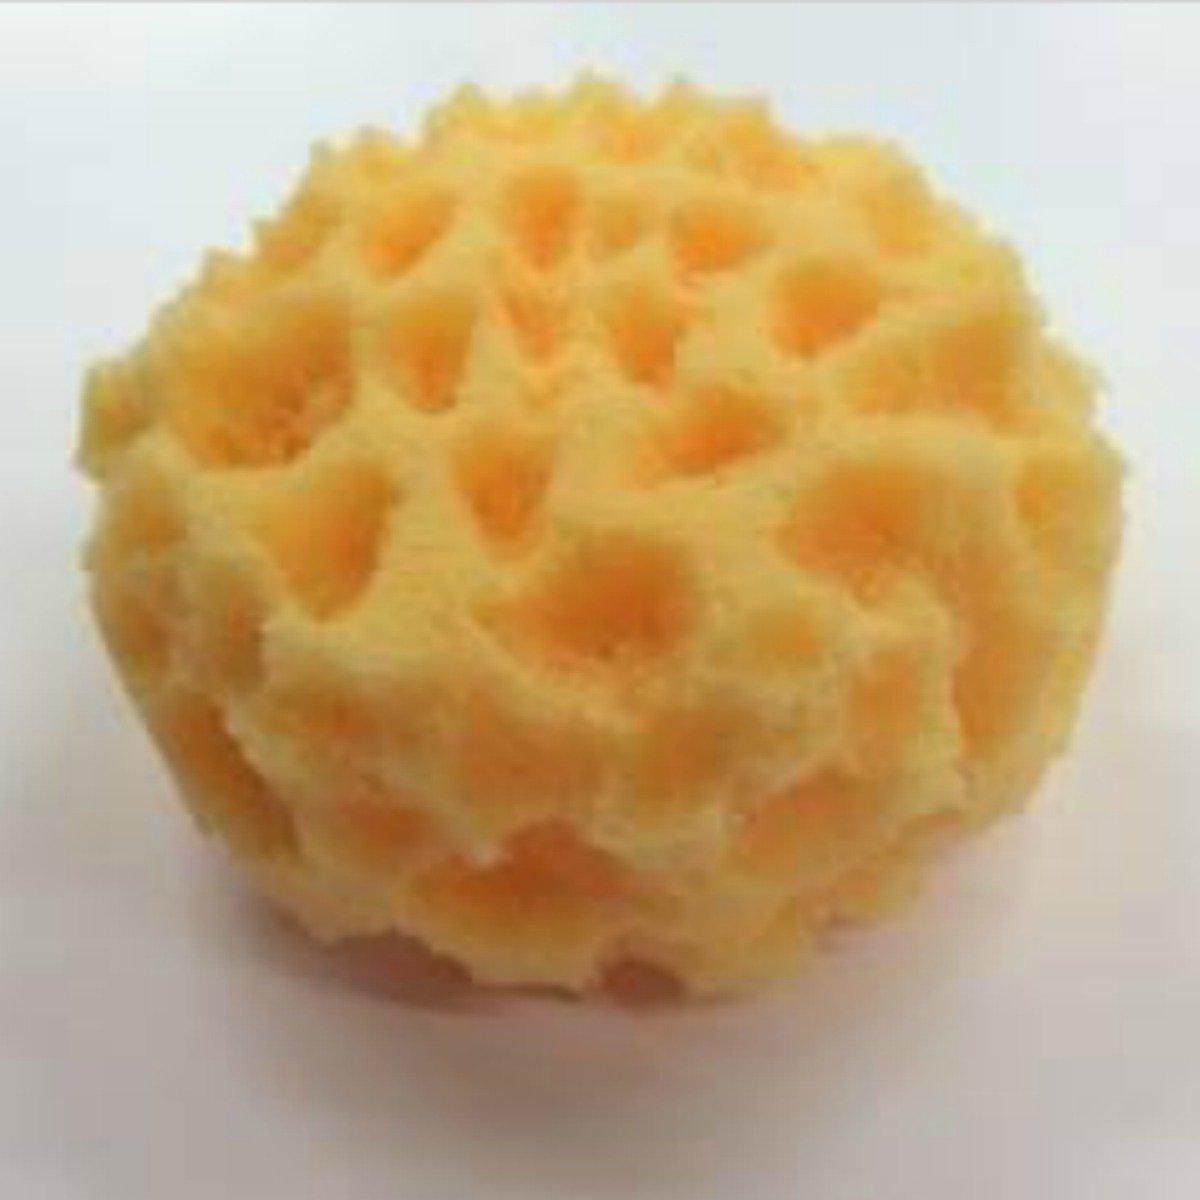 Textured Sponge - Website Cover Photo